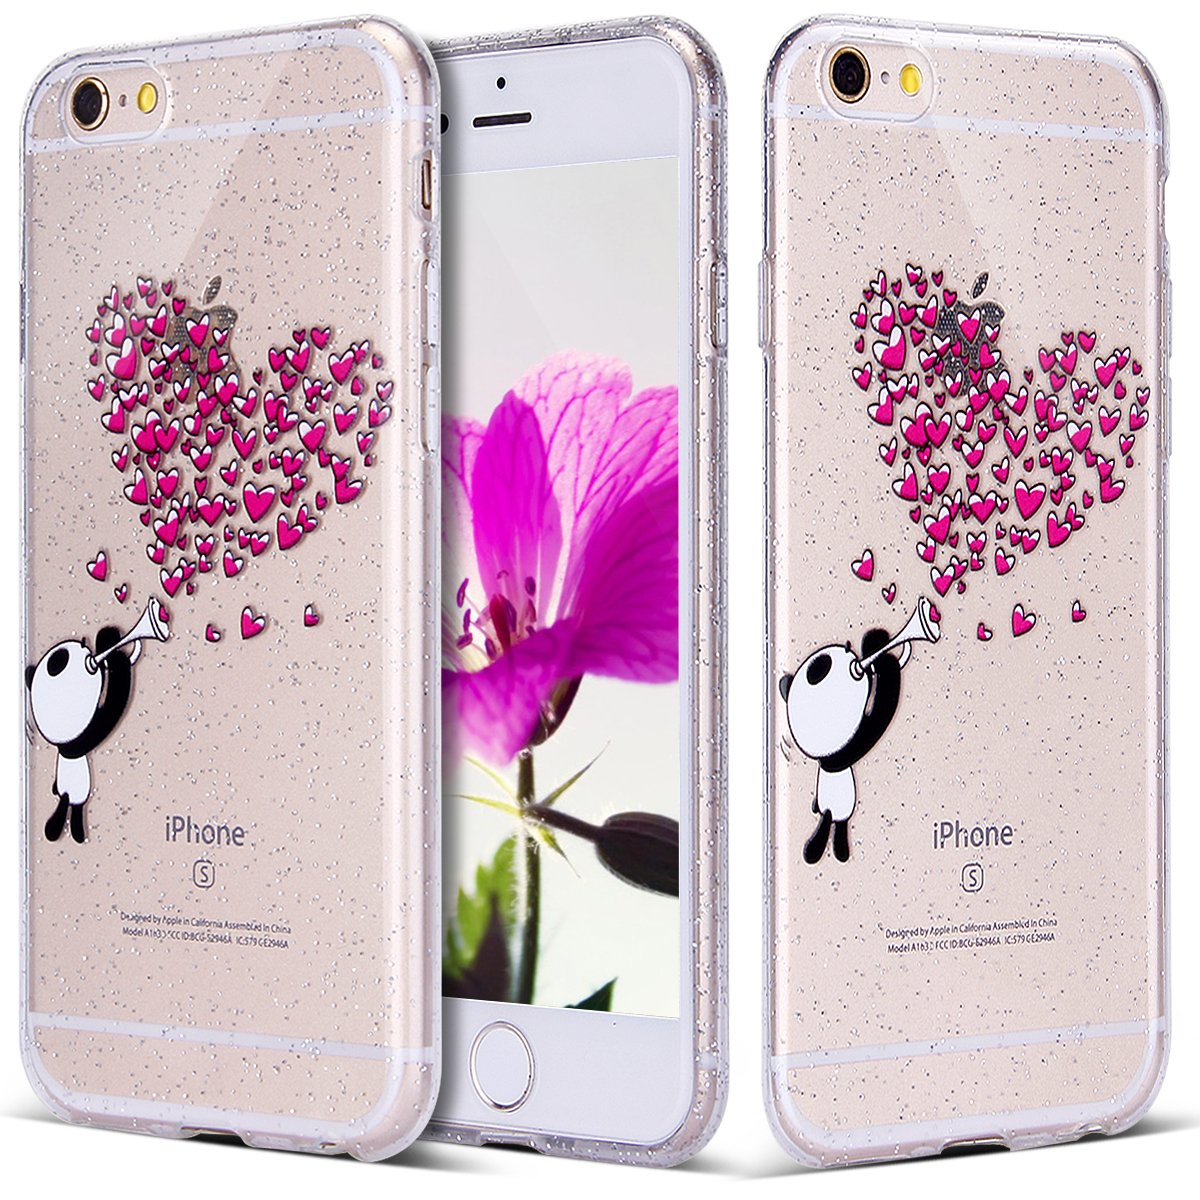 Amazon com: iPhone 6 Case, ihreesy Slim Lightweight iPhone 6S Cases